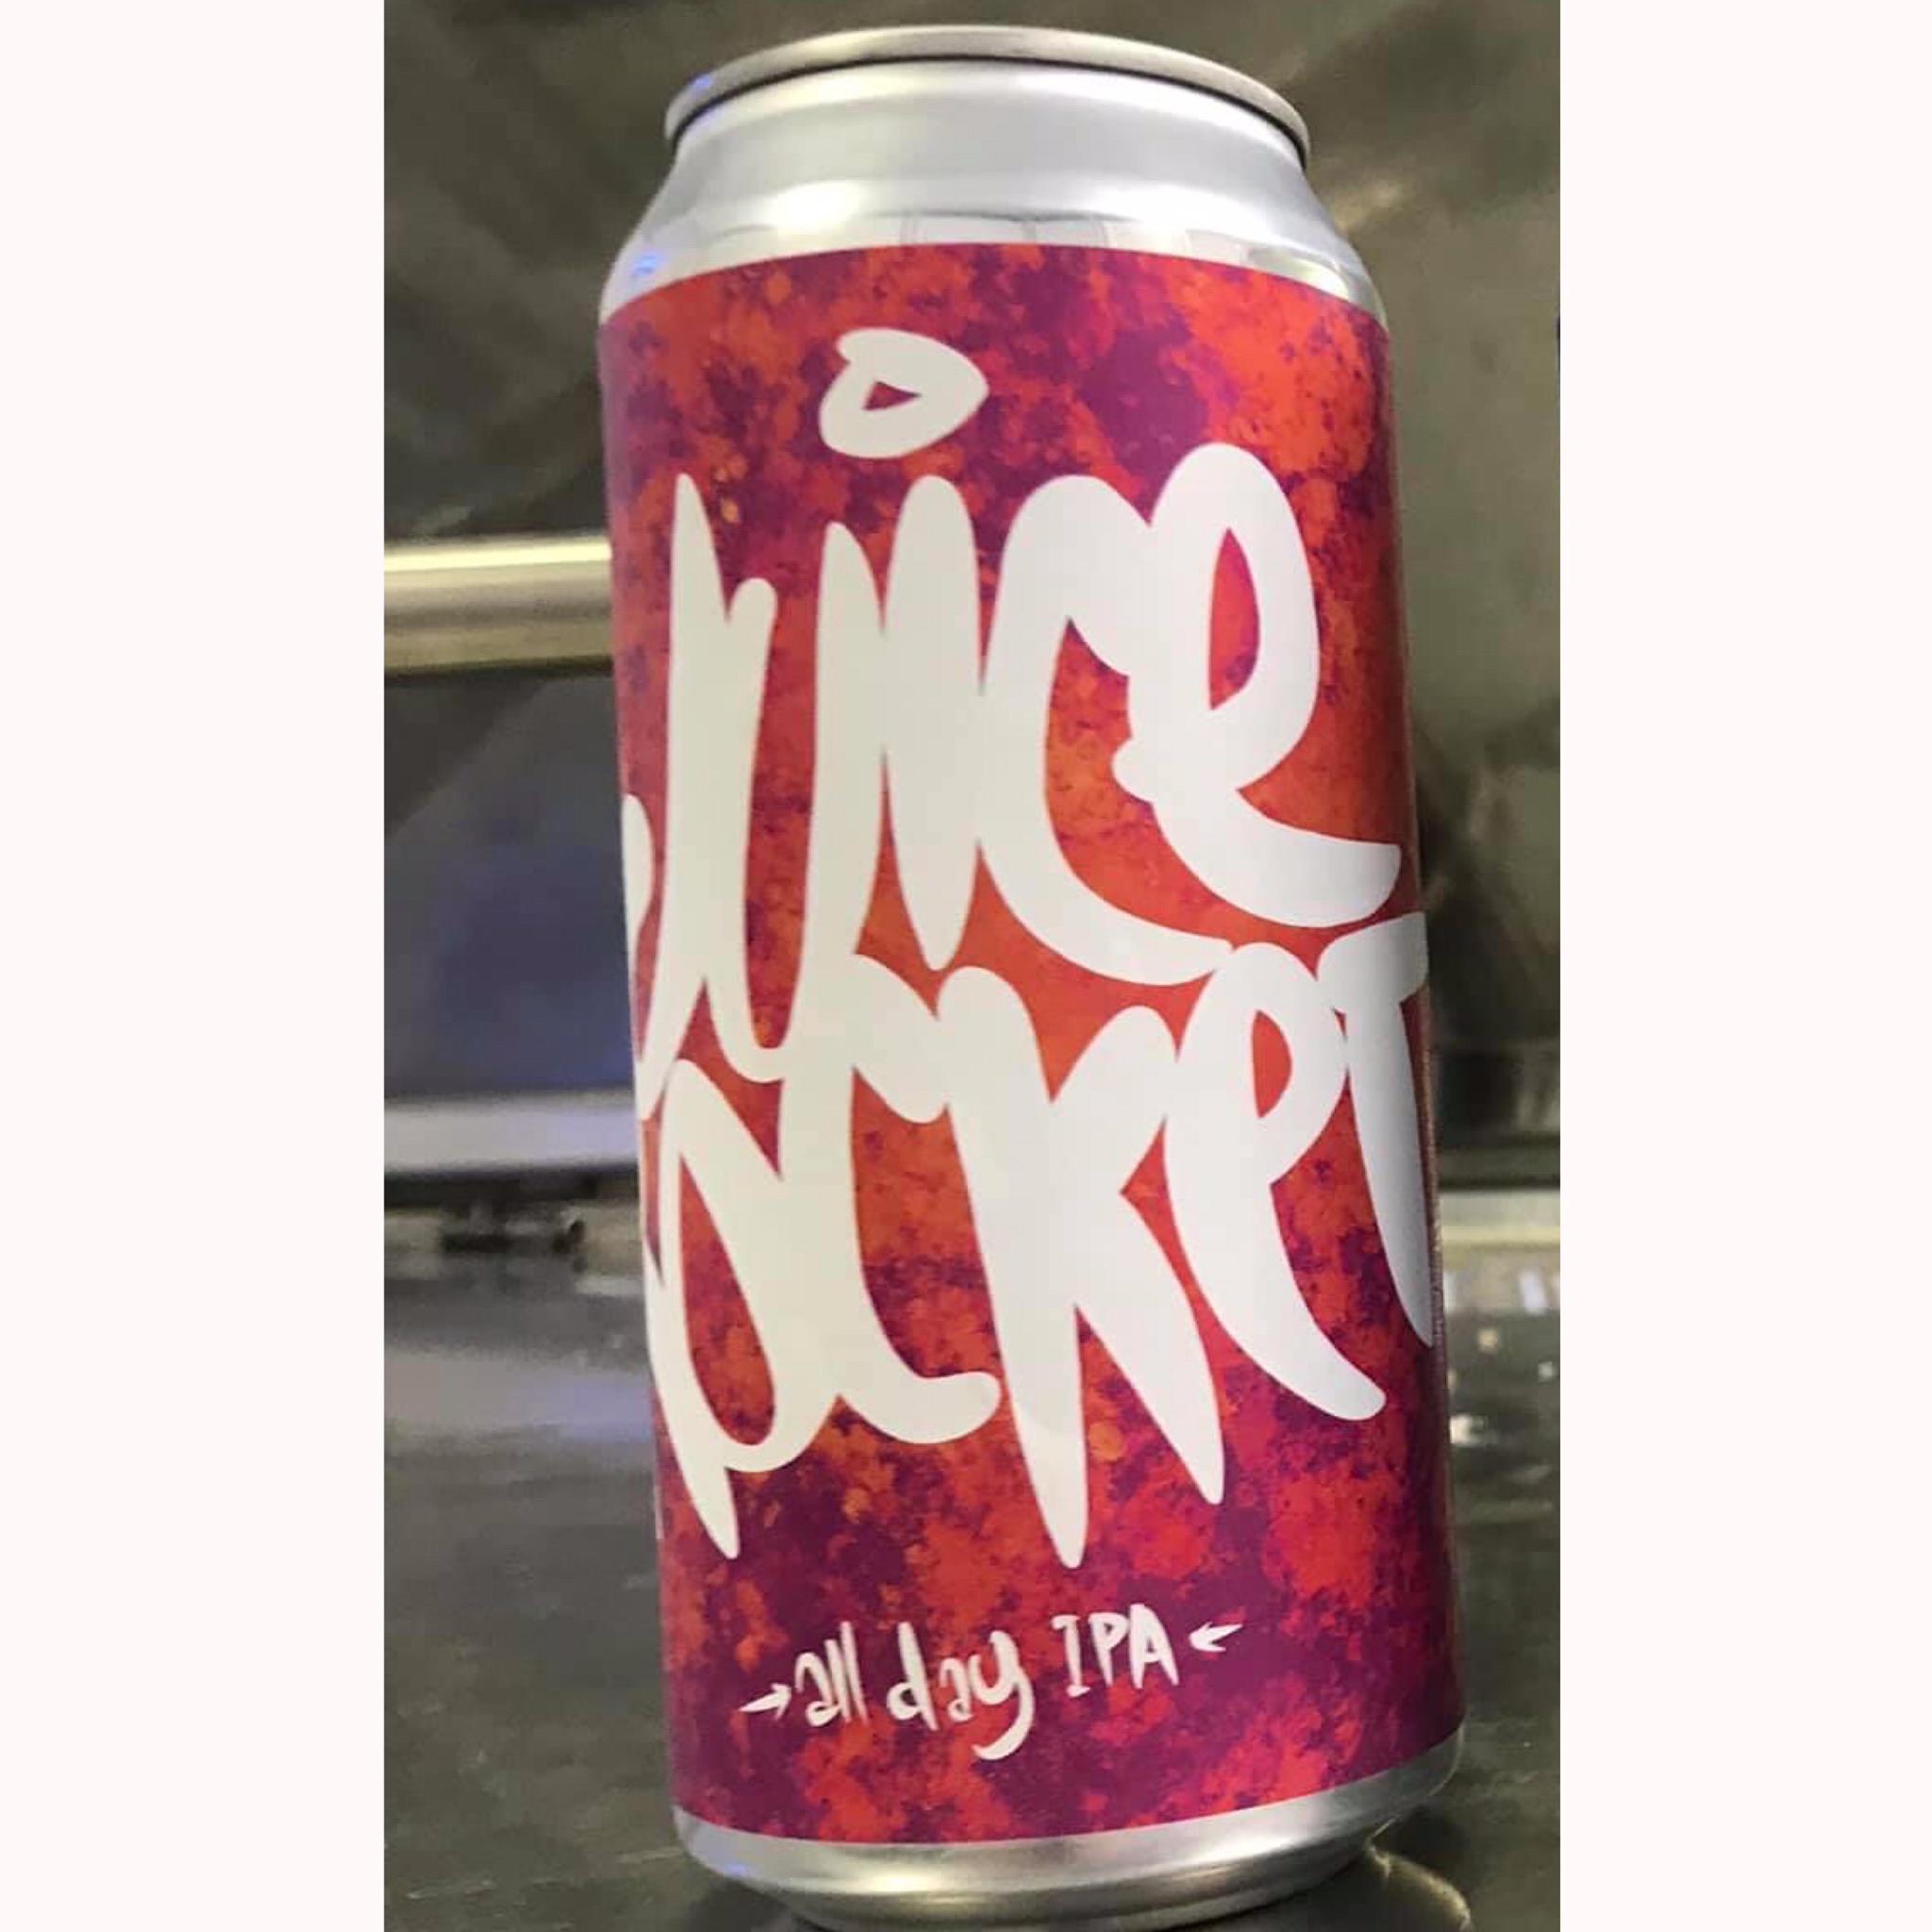 Juice Rocket IPA 4.5% 440ml Three Blind Mice Brewery